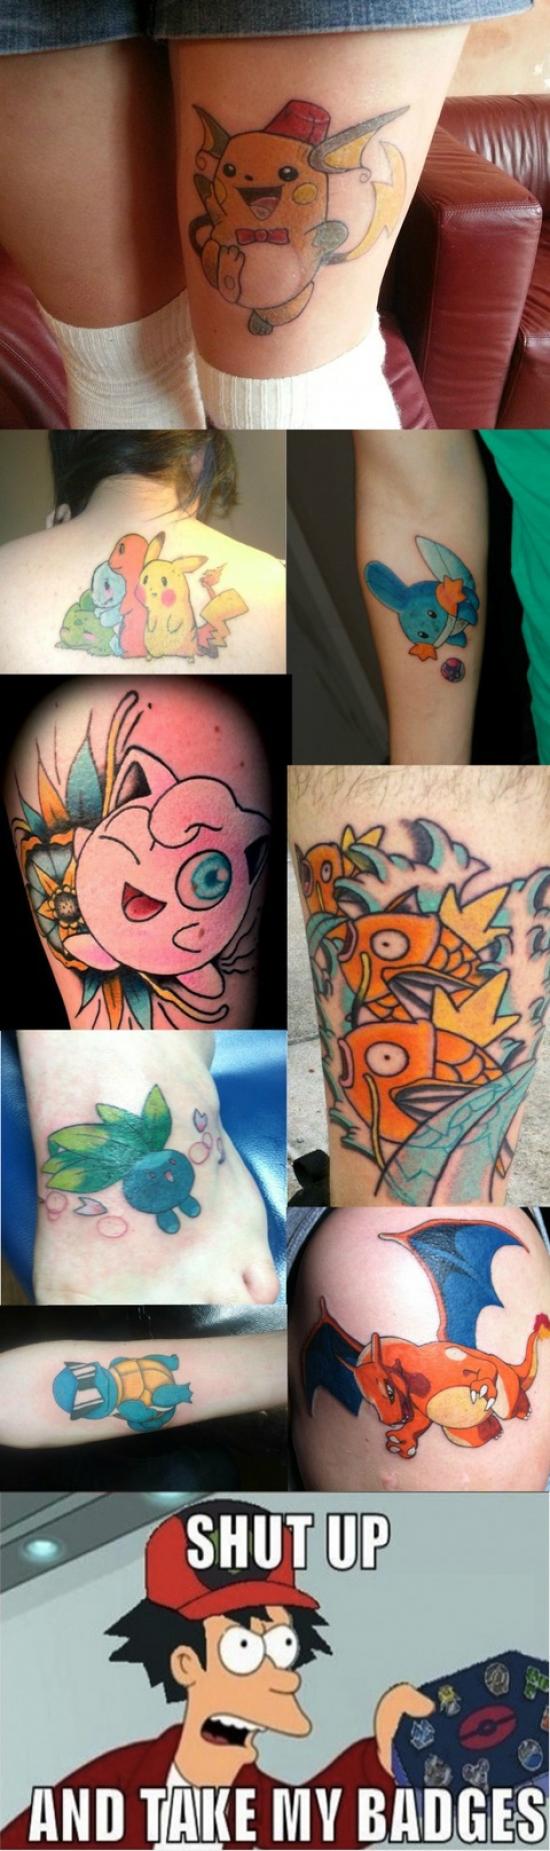 Fry - Tatuajes Pokémon